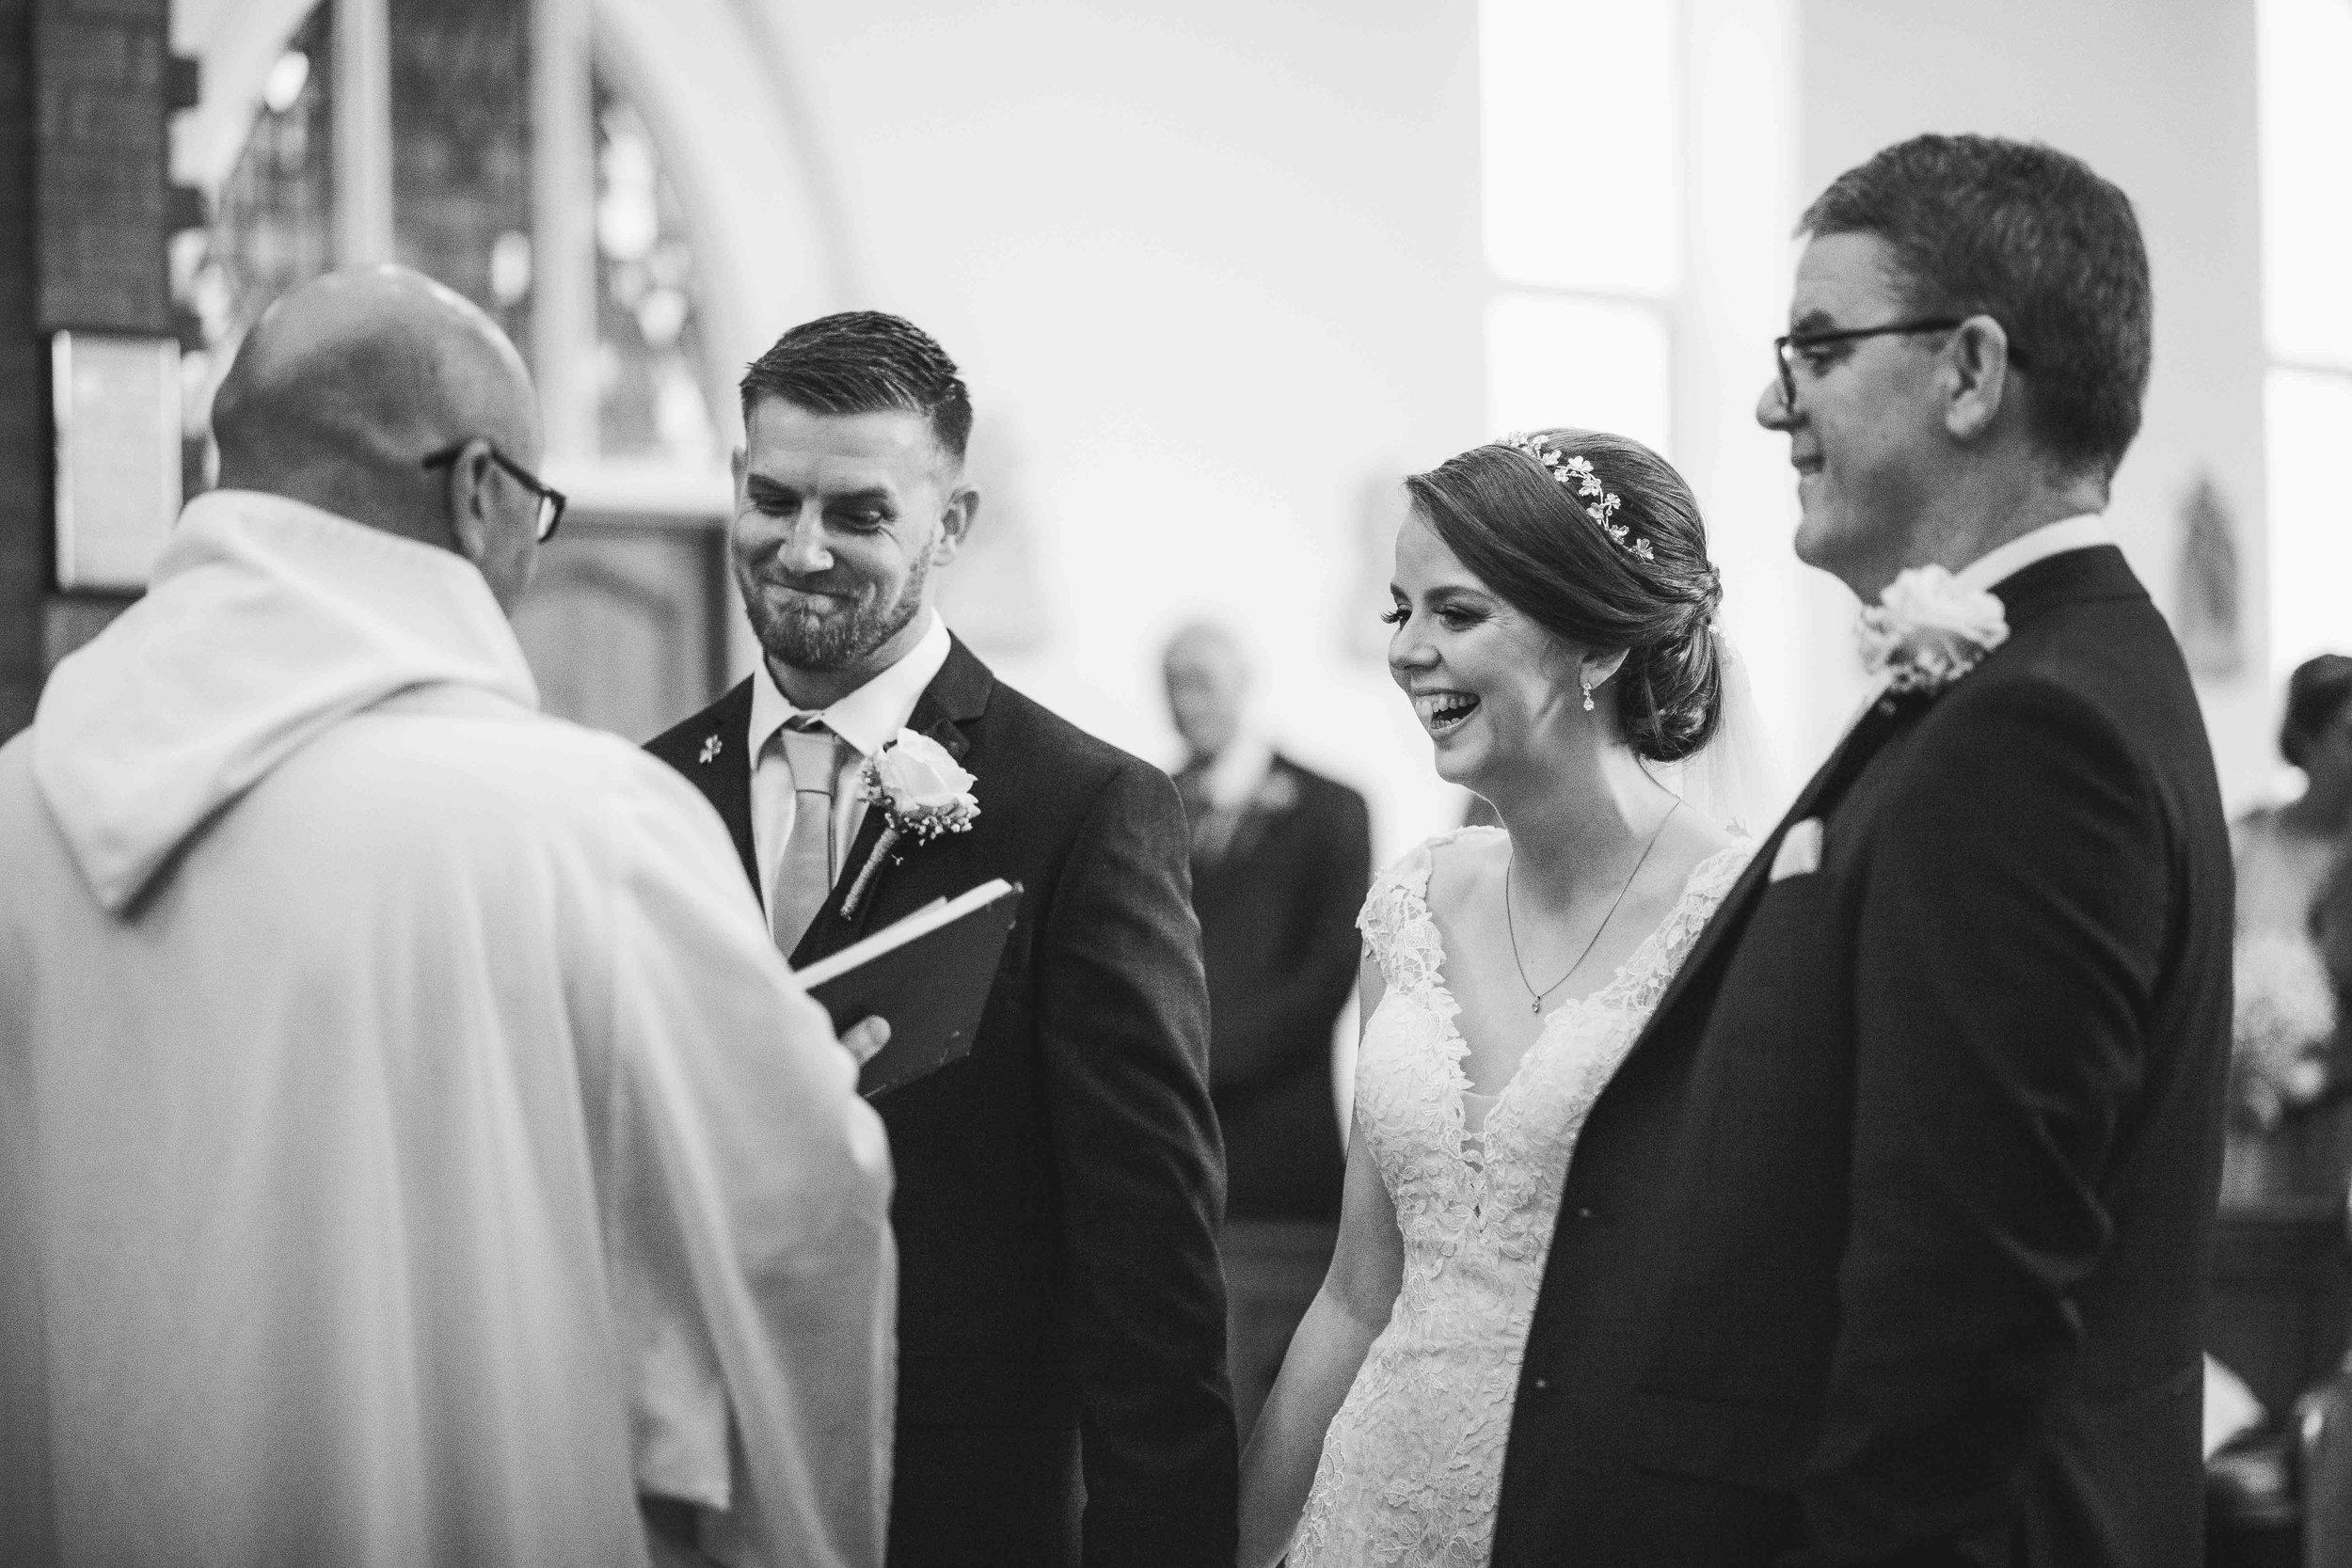 Lea-cooper-photography-willenhall-wolverhampton-wedding-photographer-birmingham-shirley-west-midlands-ceremony-church-9.JPG